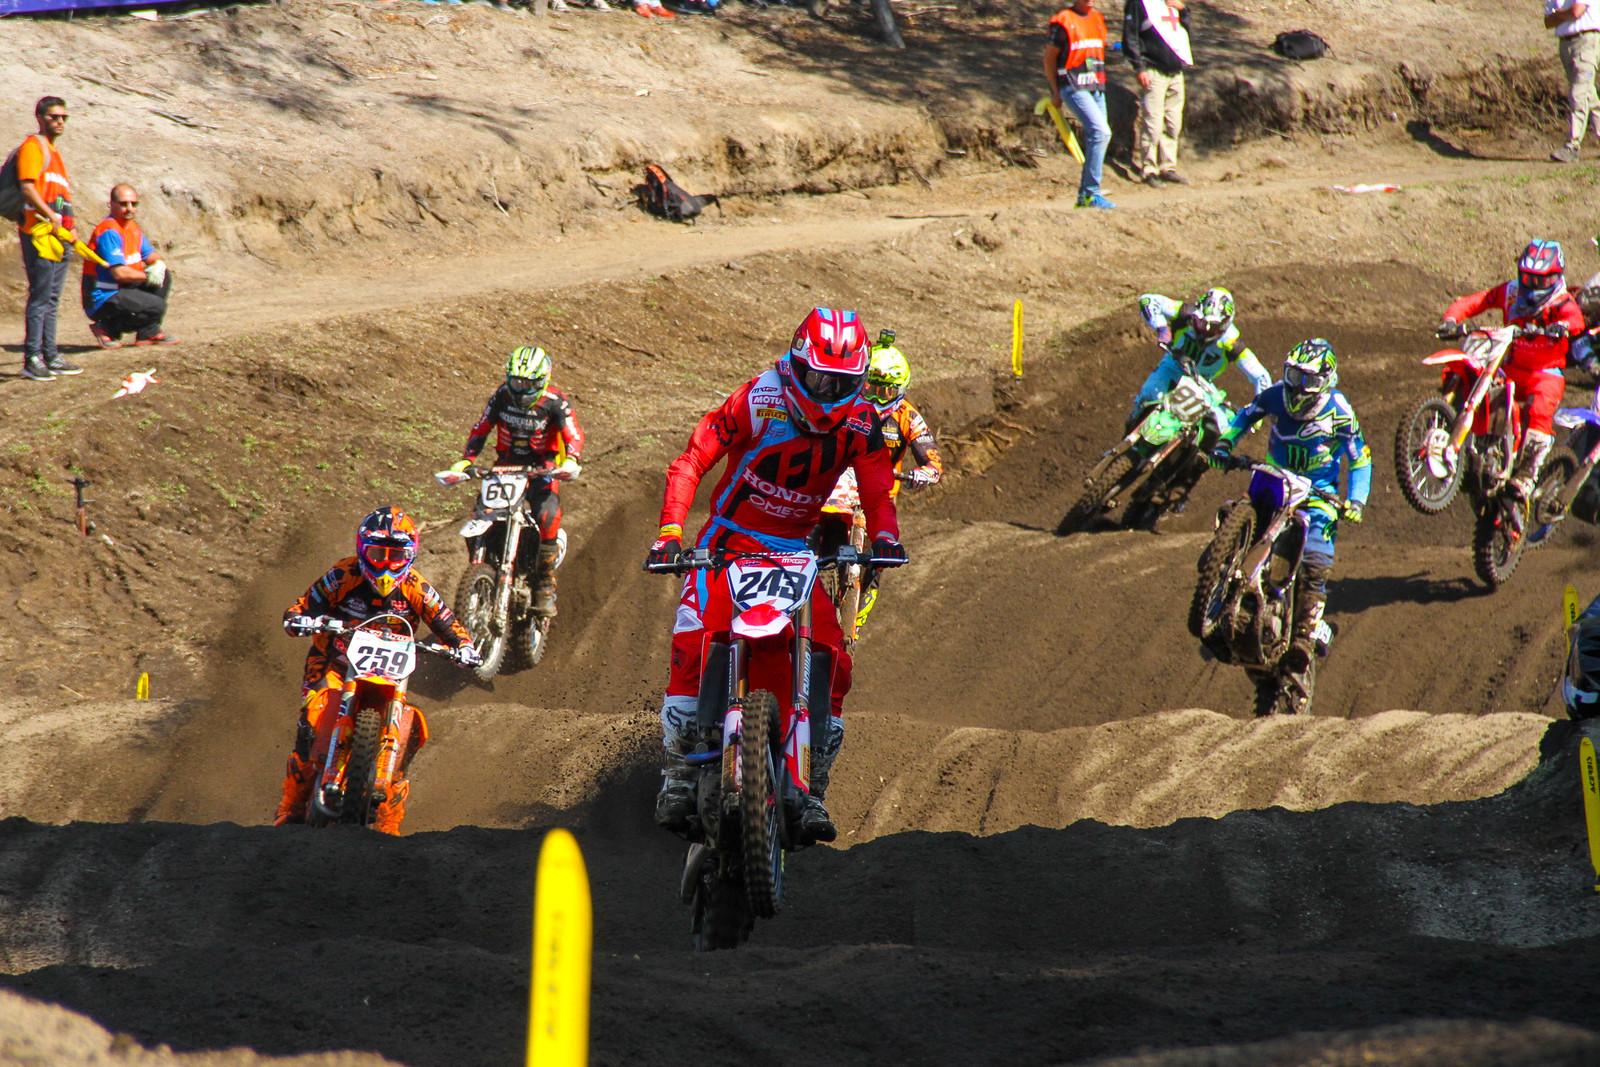 Tim Gajser - Photo Blast: 2017 MXGP of Argentina - Motocross Pictures - Vital MX